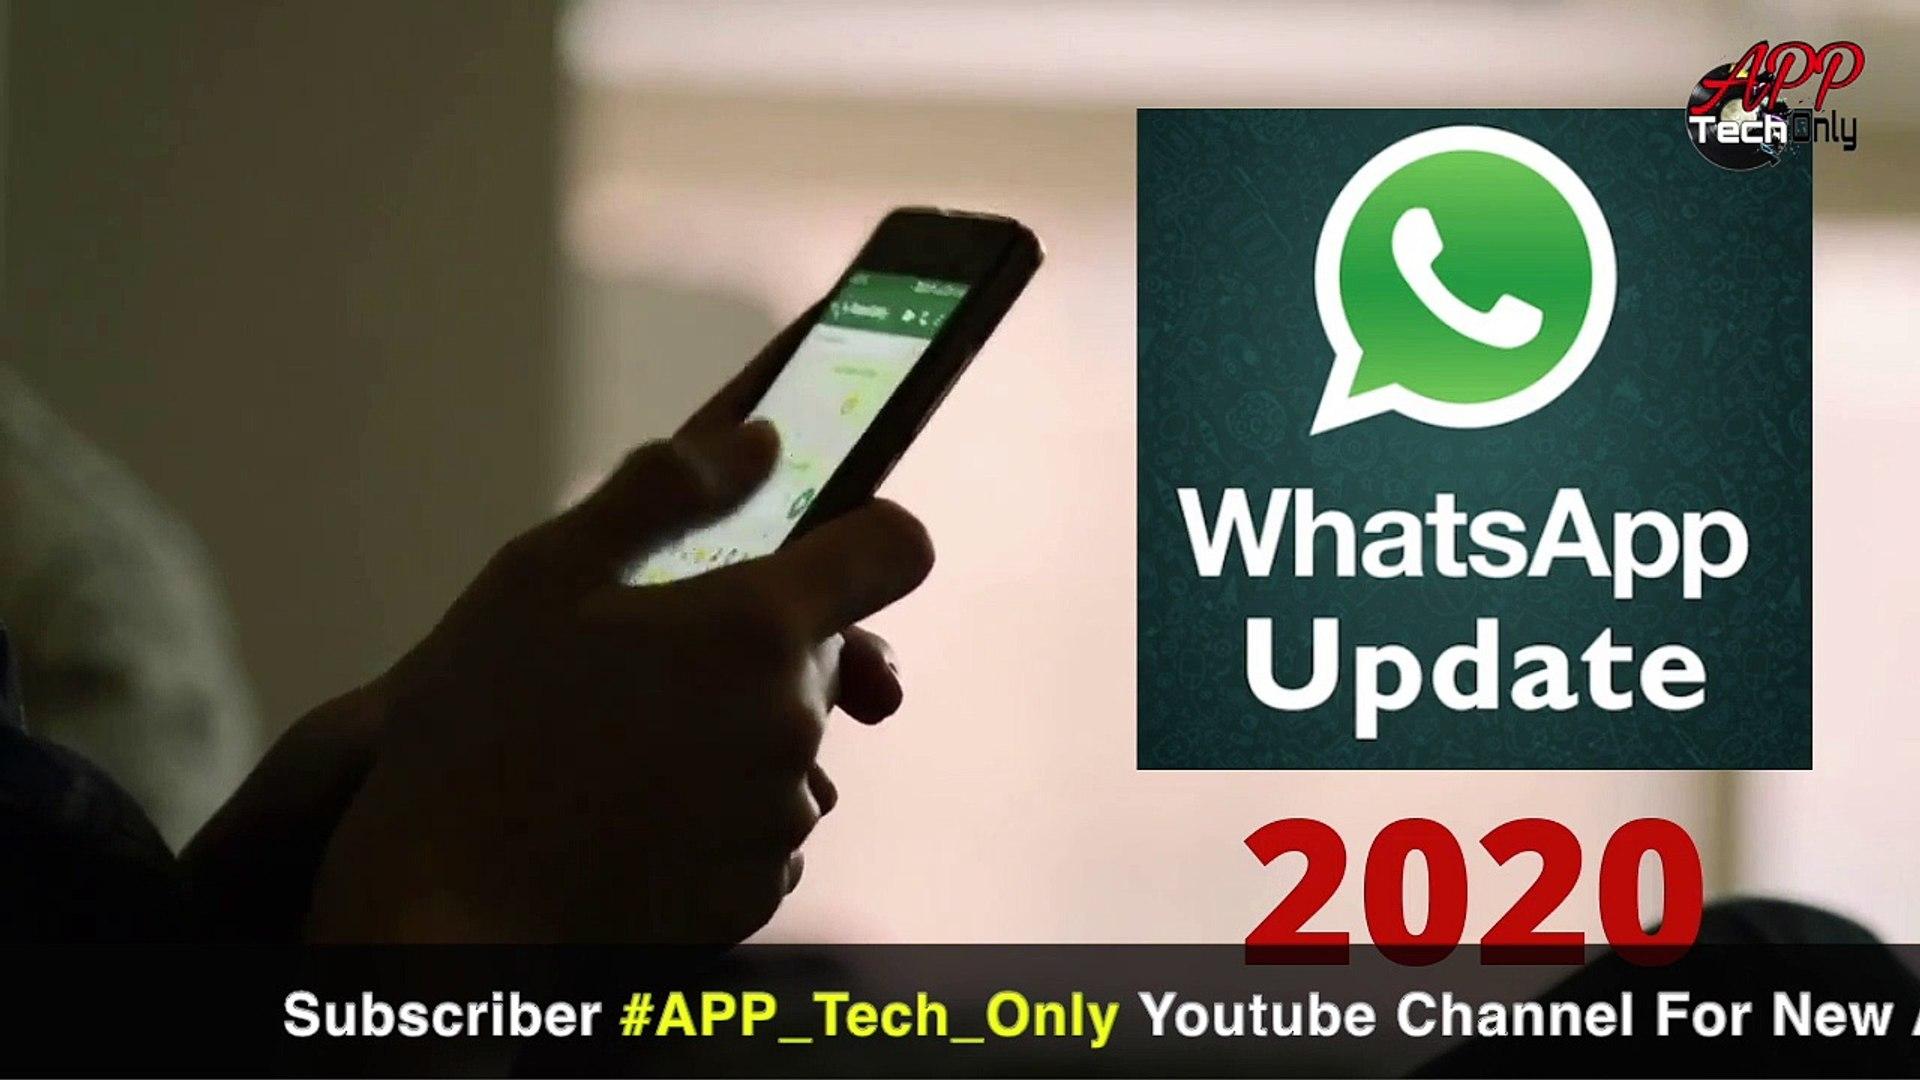 नए साल पर बदल जाएगा आपका WhatsApp, WhatsApp new update 2020, Biggest WhatsApp updates New Years 2020